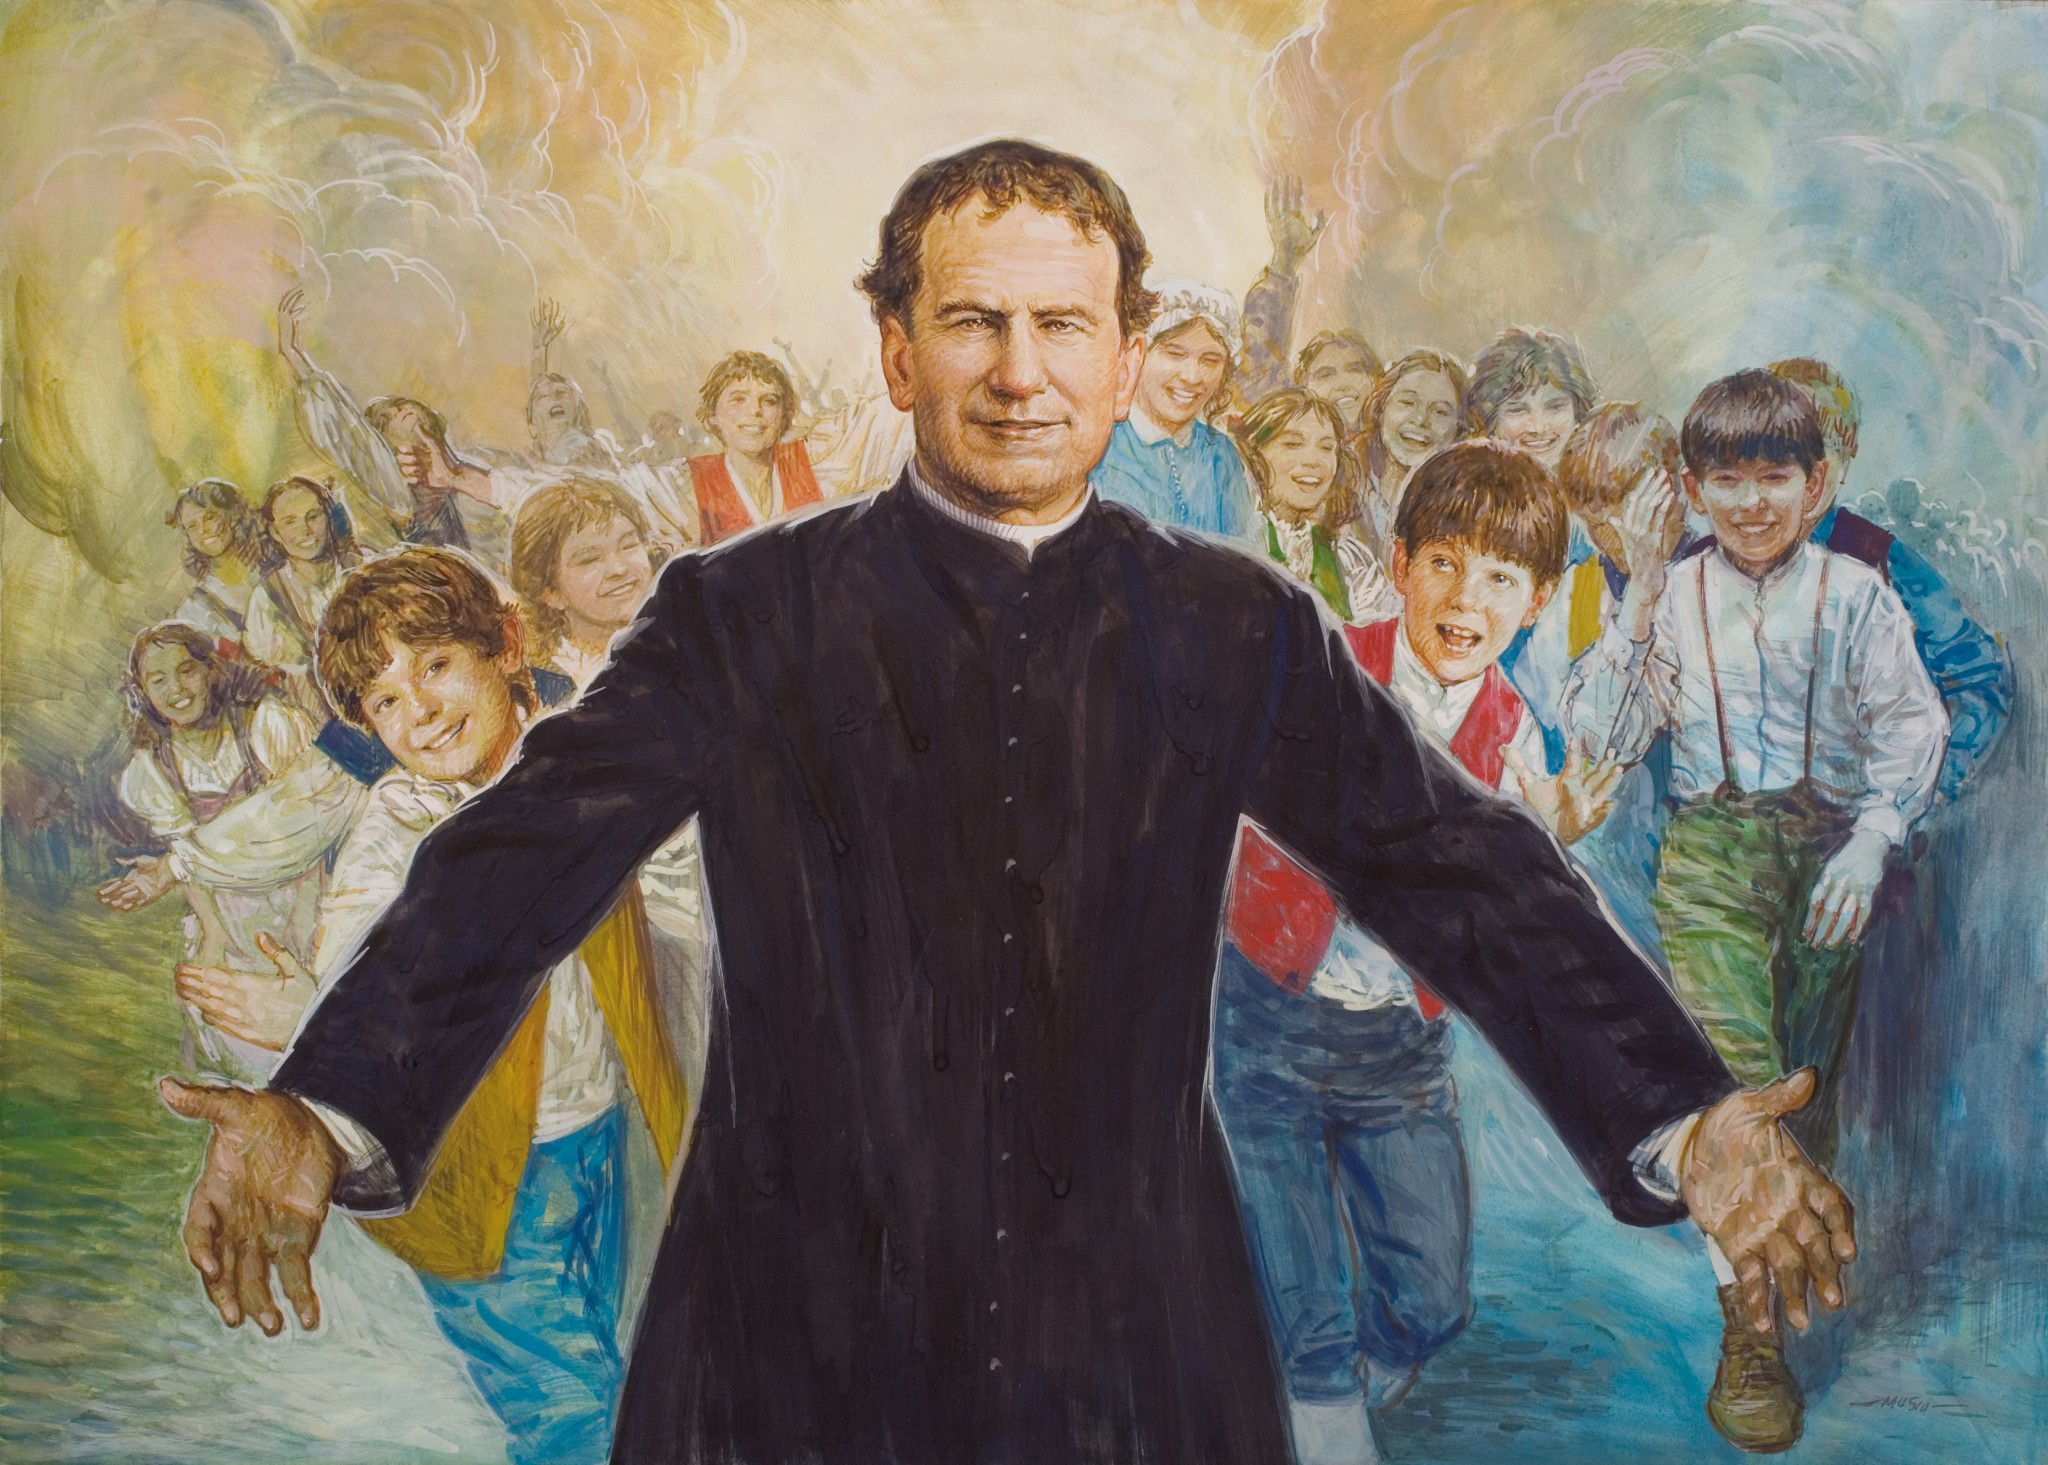 Don Bosco: St. Francis School